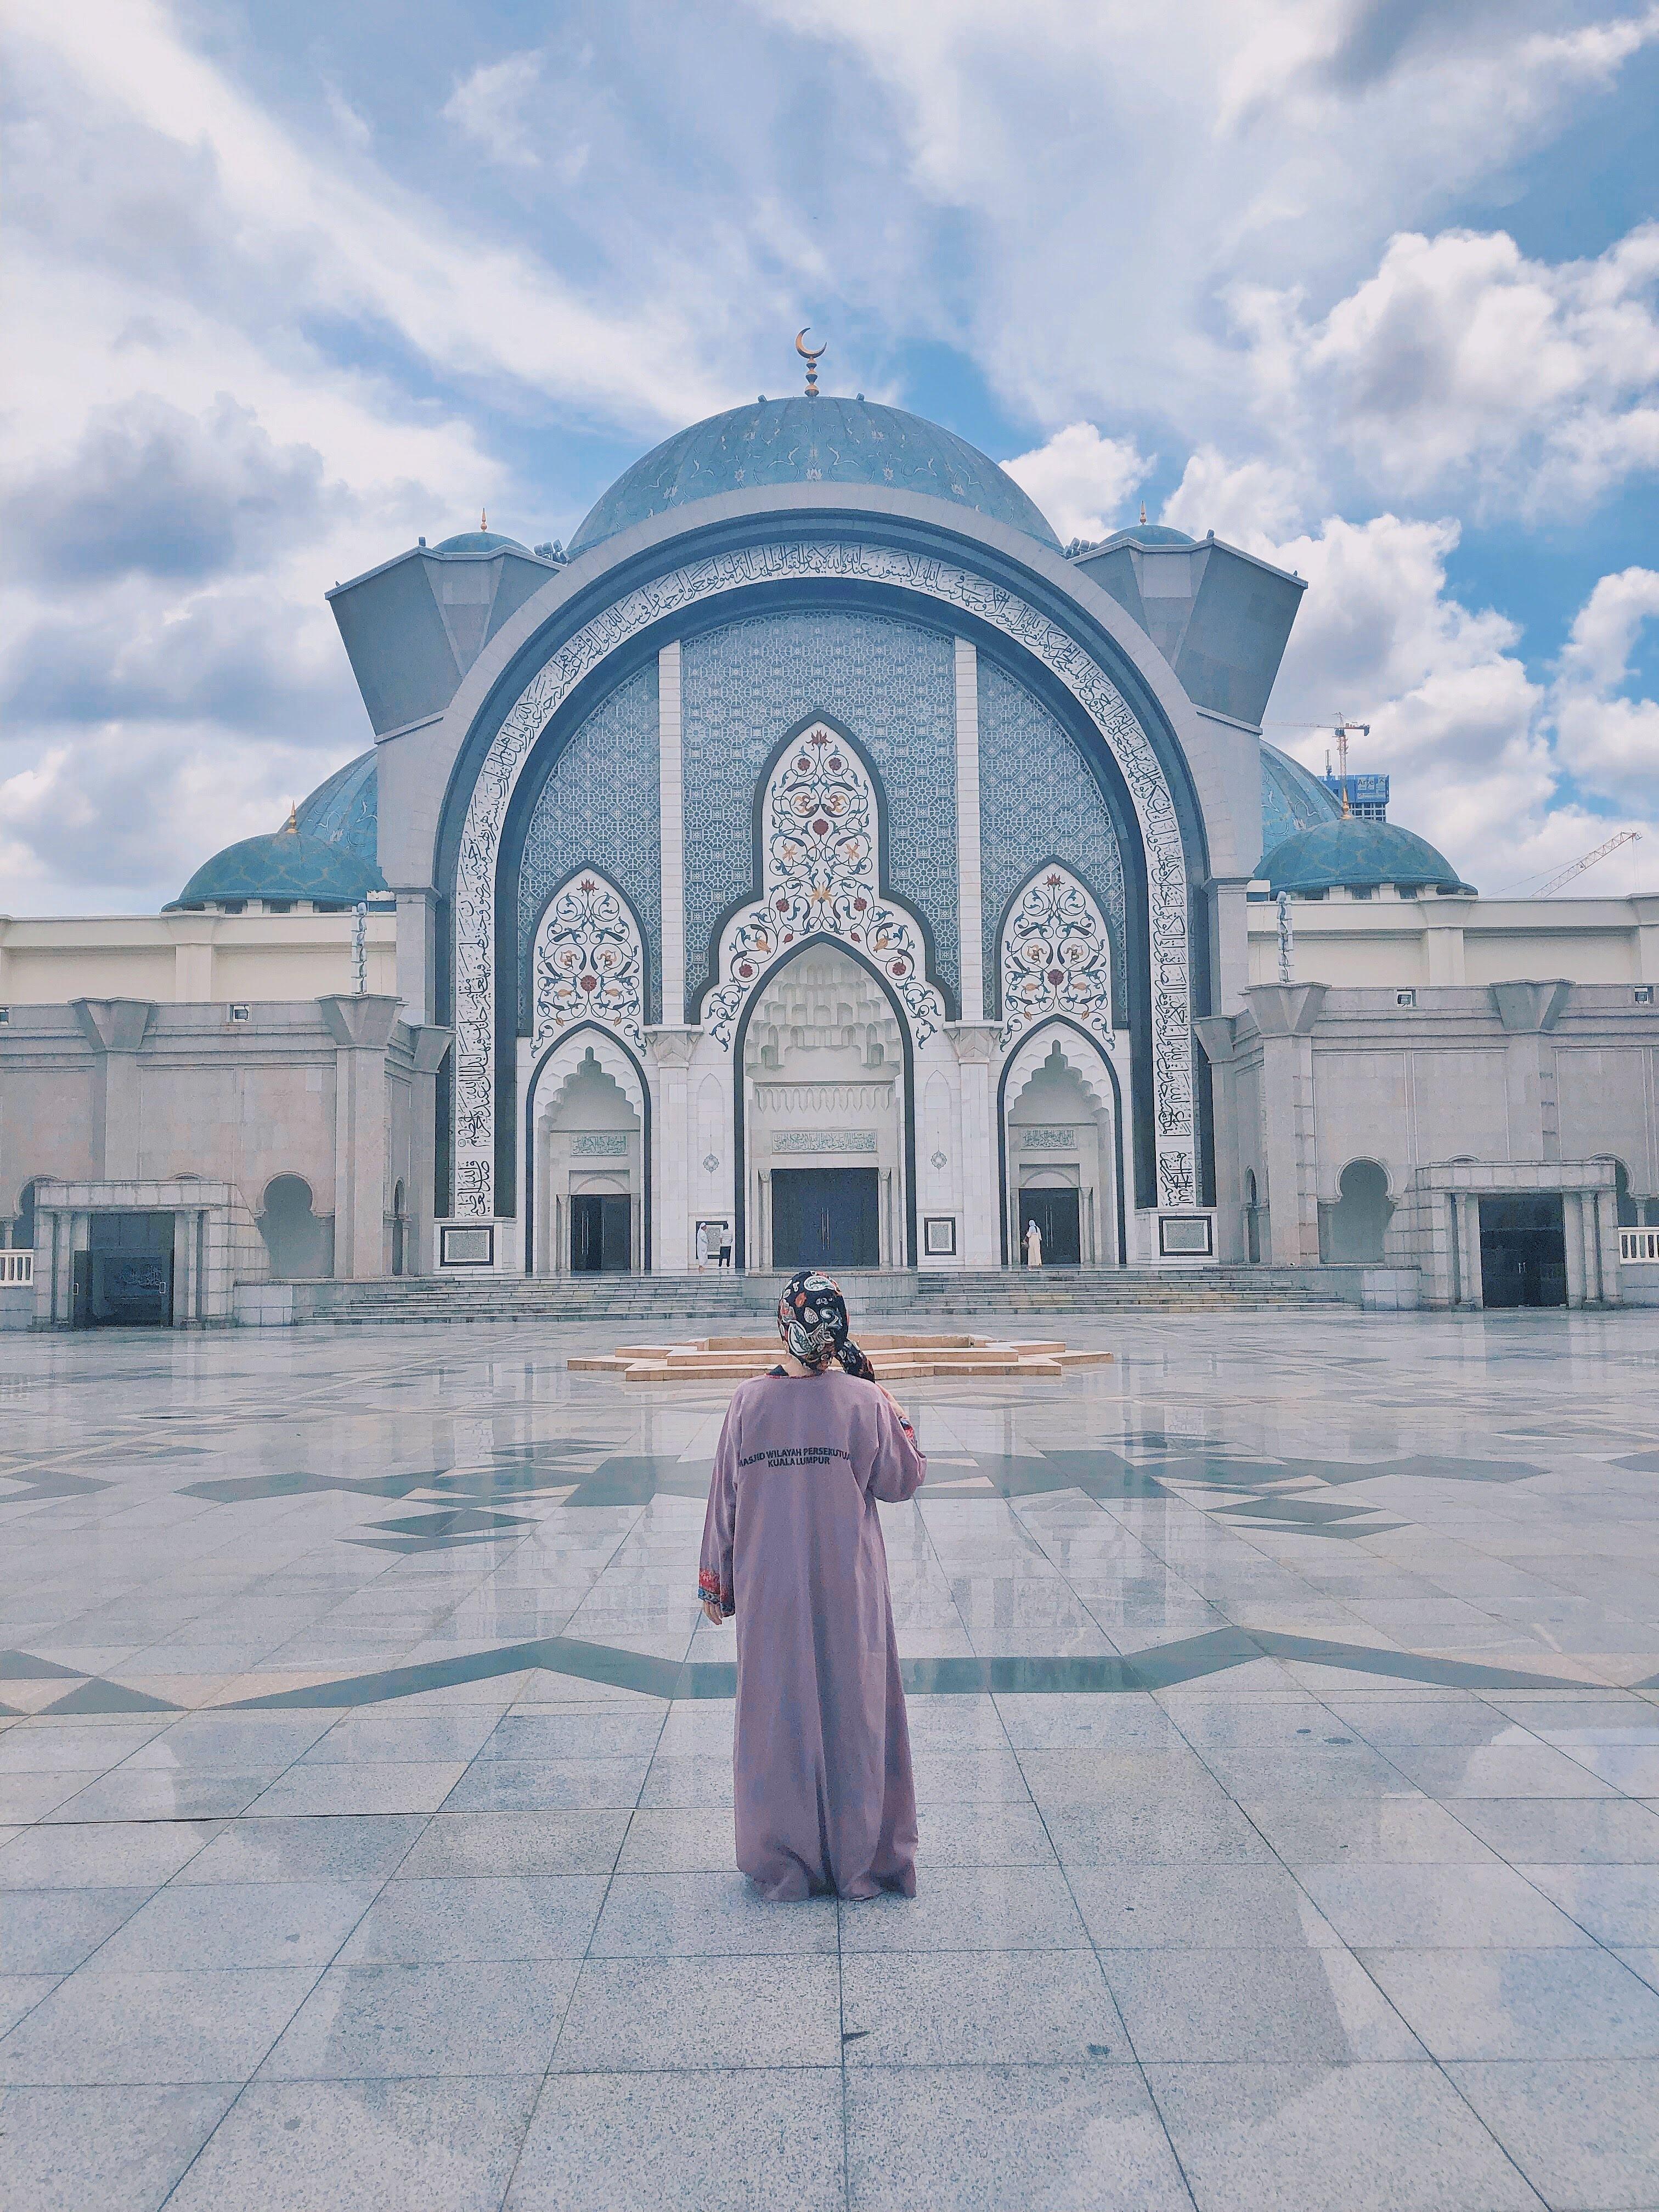 "Malaysia_MasjidWilayahPersekutuan_020"""""